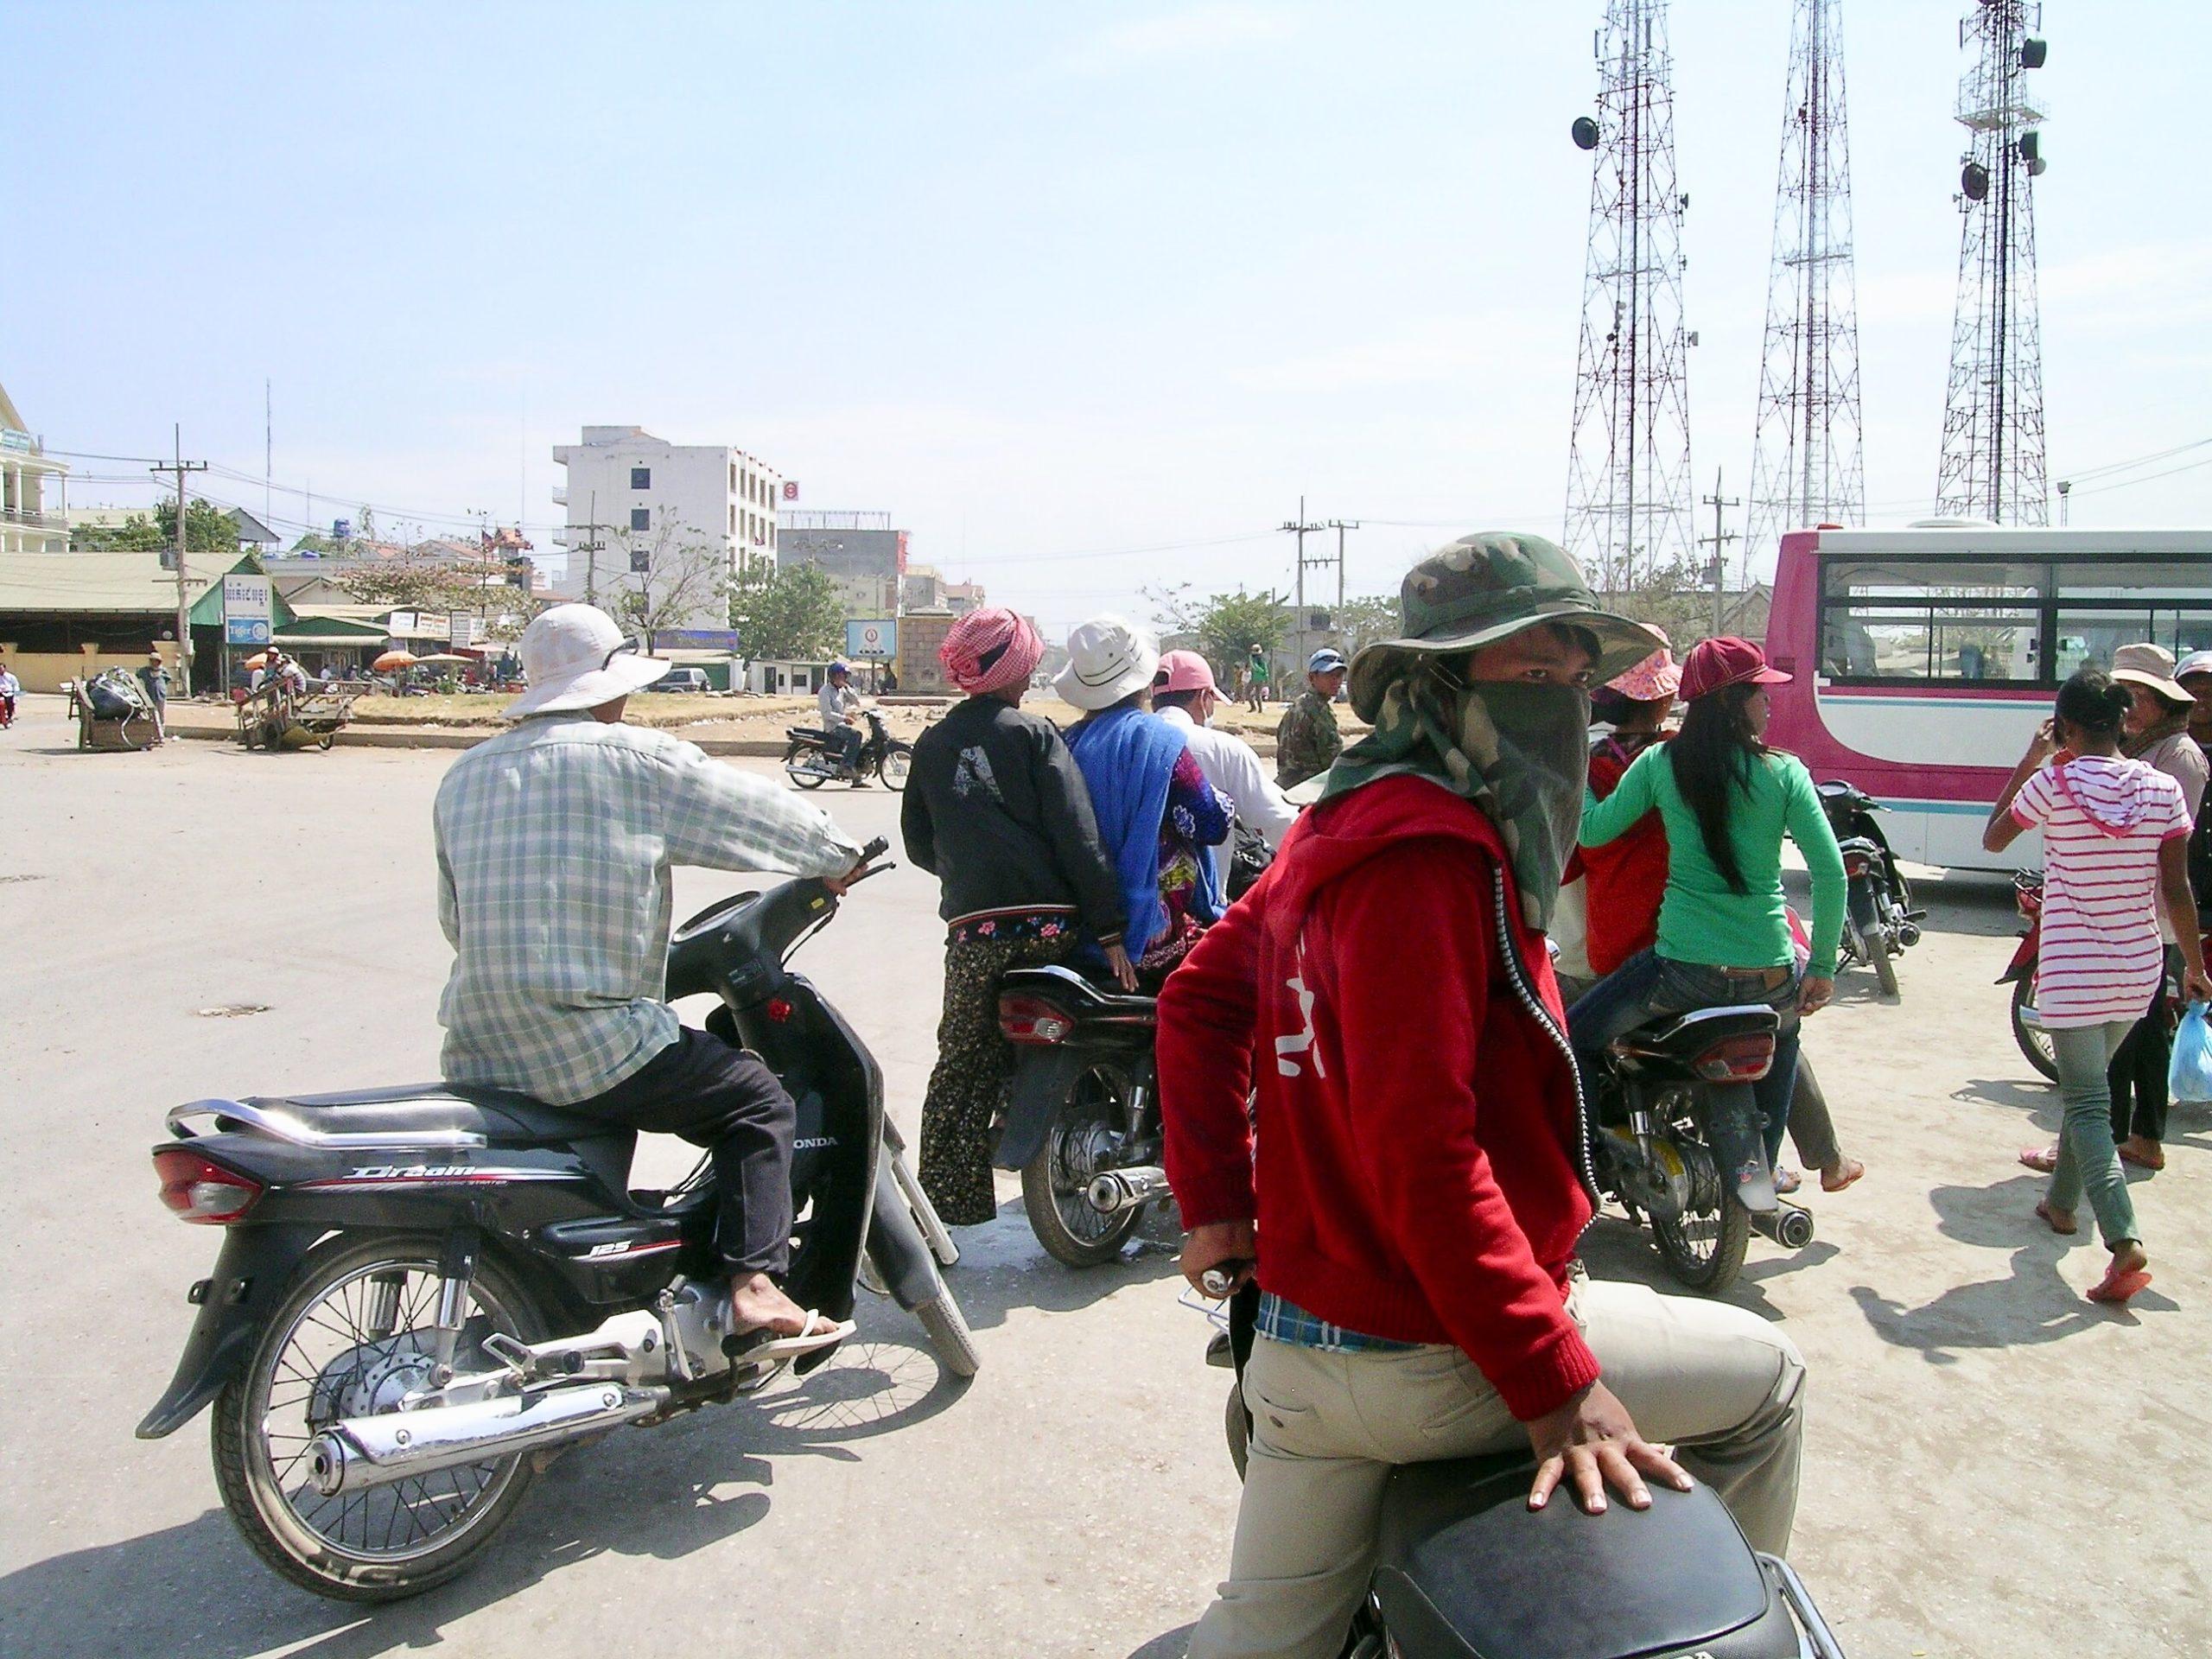 Bangkok'tan Kamboçya Sınırına Tayland-Aran